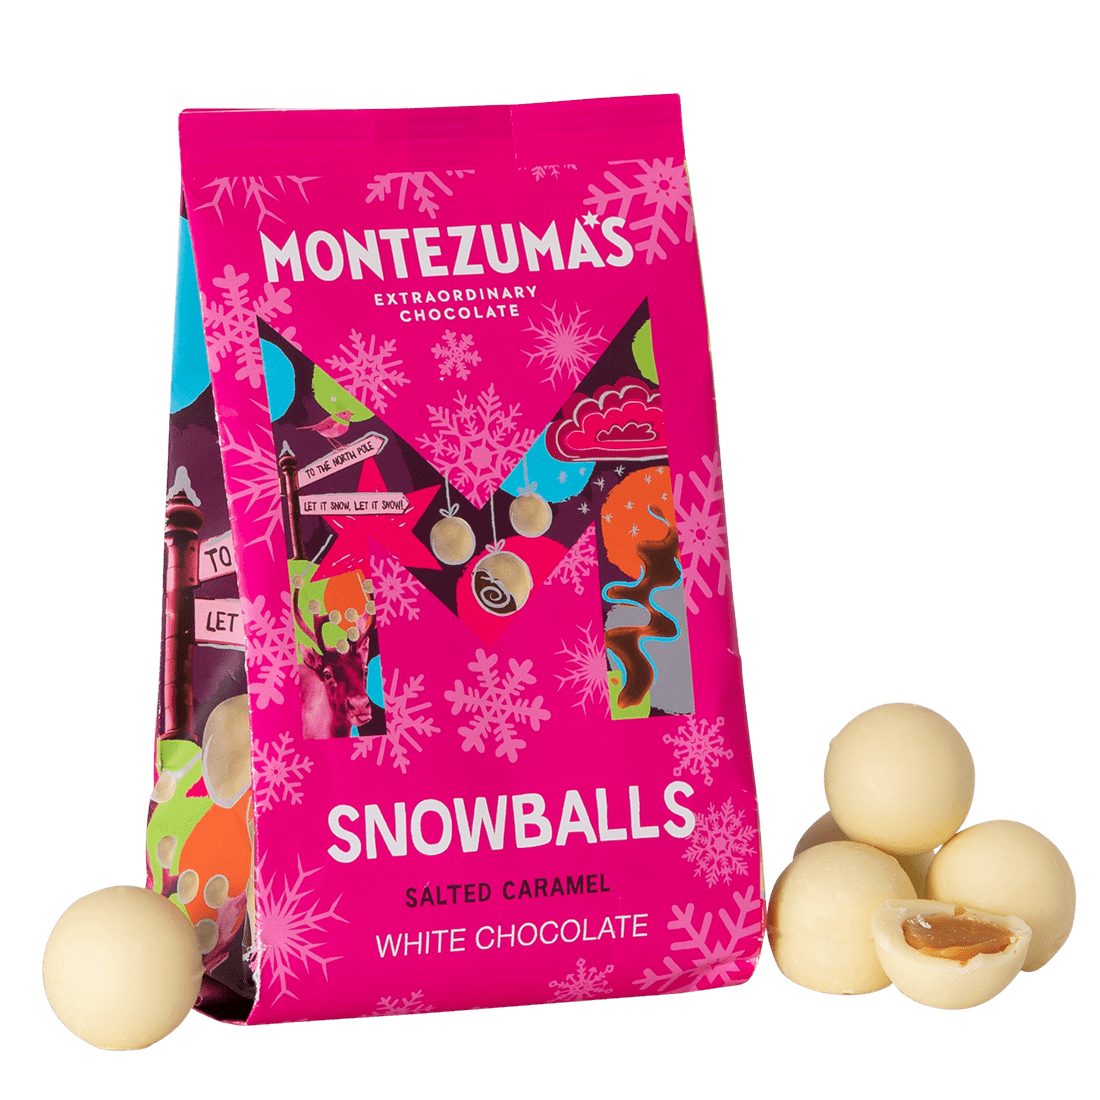 White Chocolate Salted Caramel Snowballs